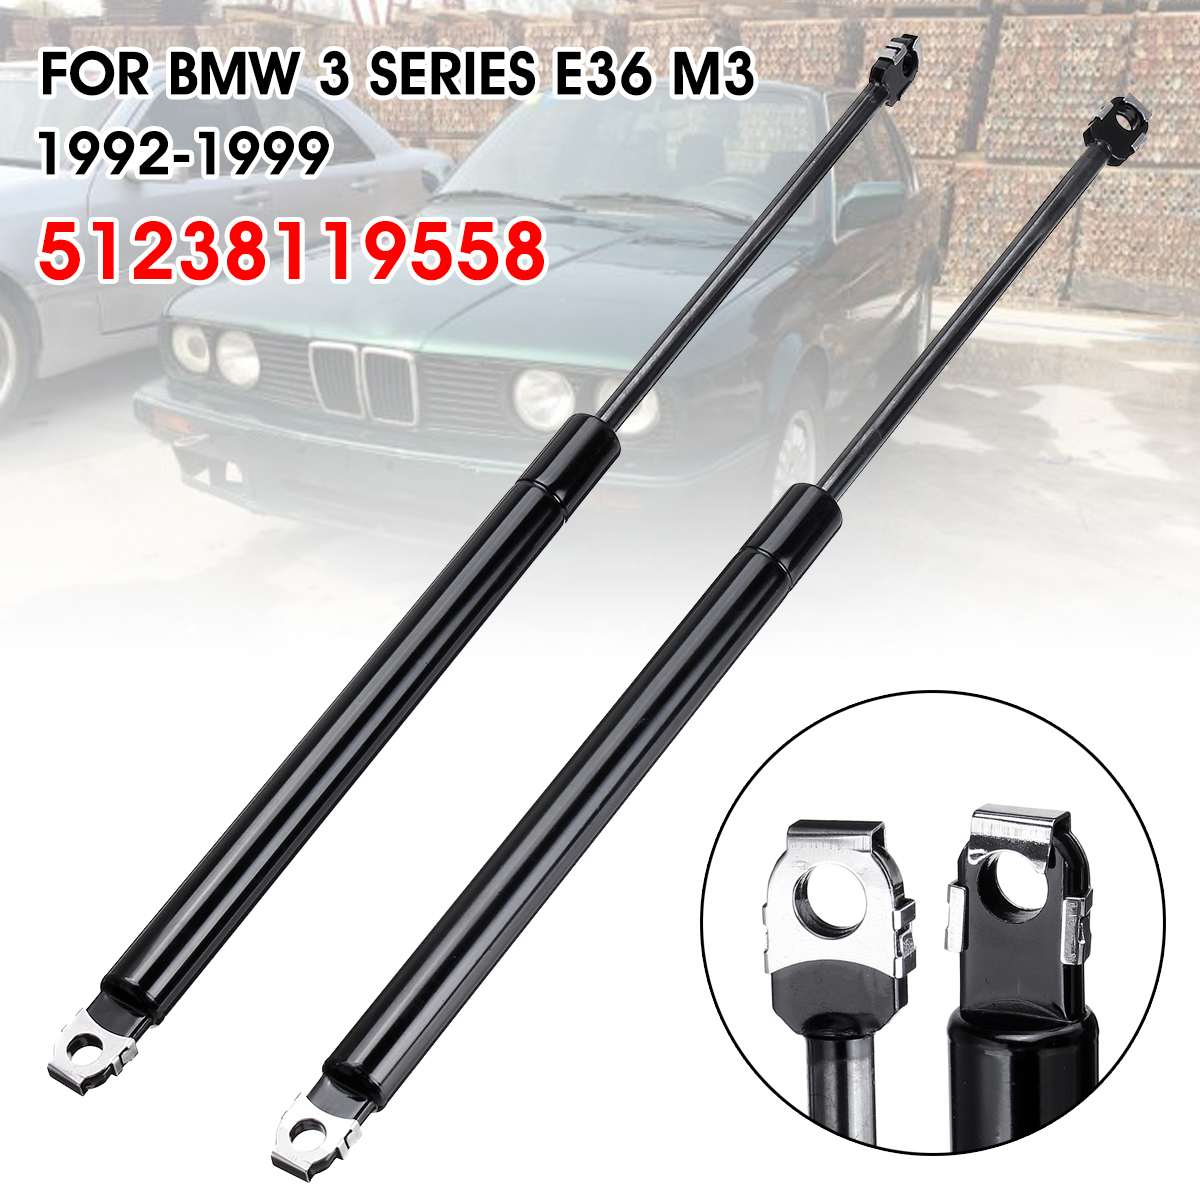 16 Inch Aero-D Flat Rear Wiper Blade Windscreen Part For BMW E36 Touring 95-99